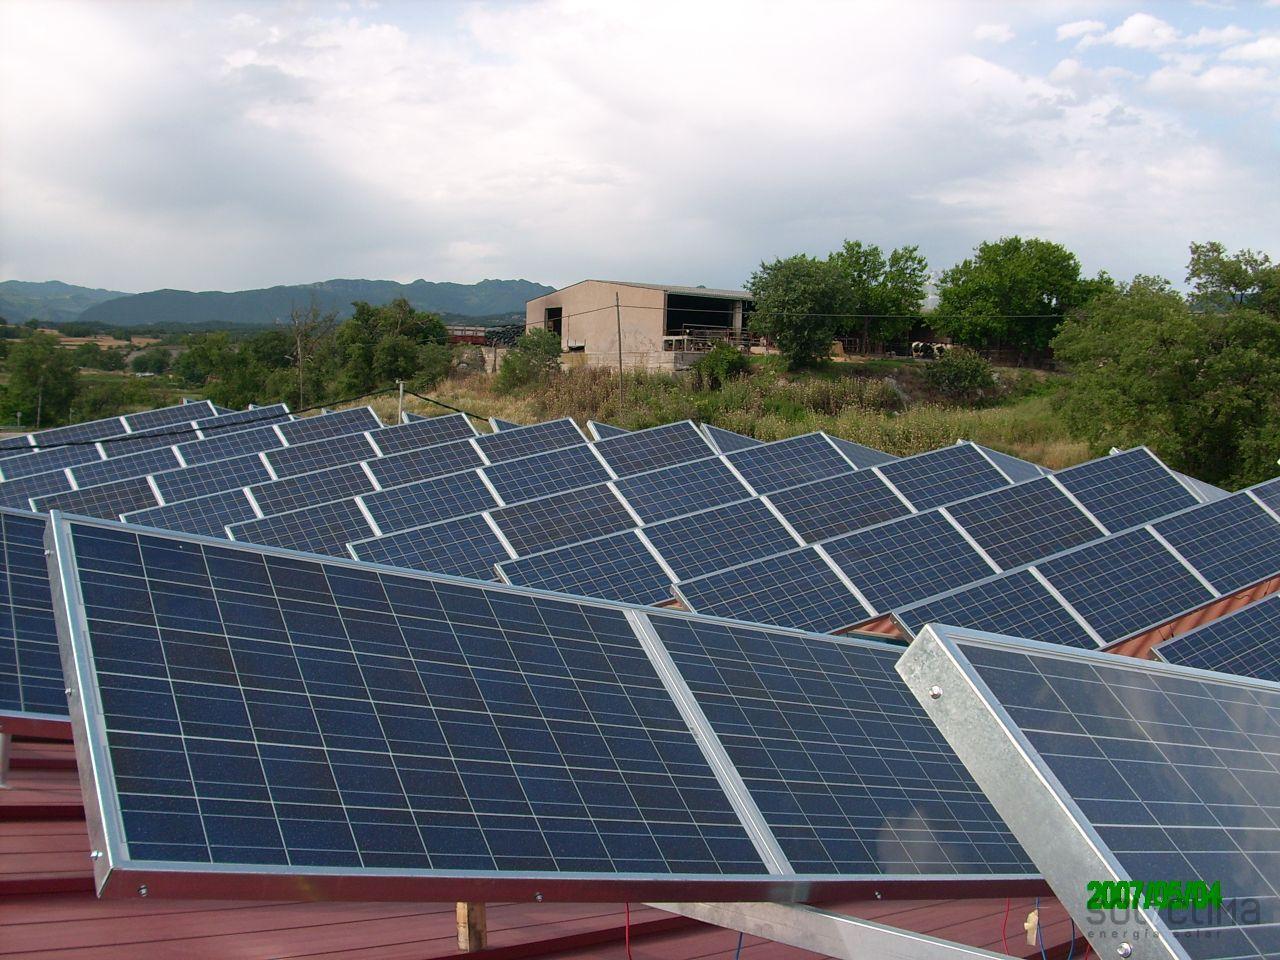 Instalaci n solar fotovoltaica for Instalacion fotovoltaica conectada a red